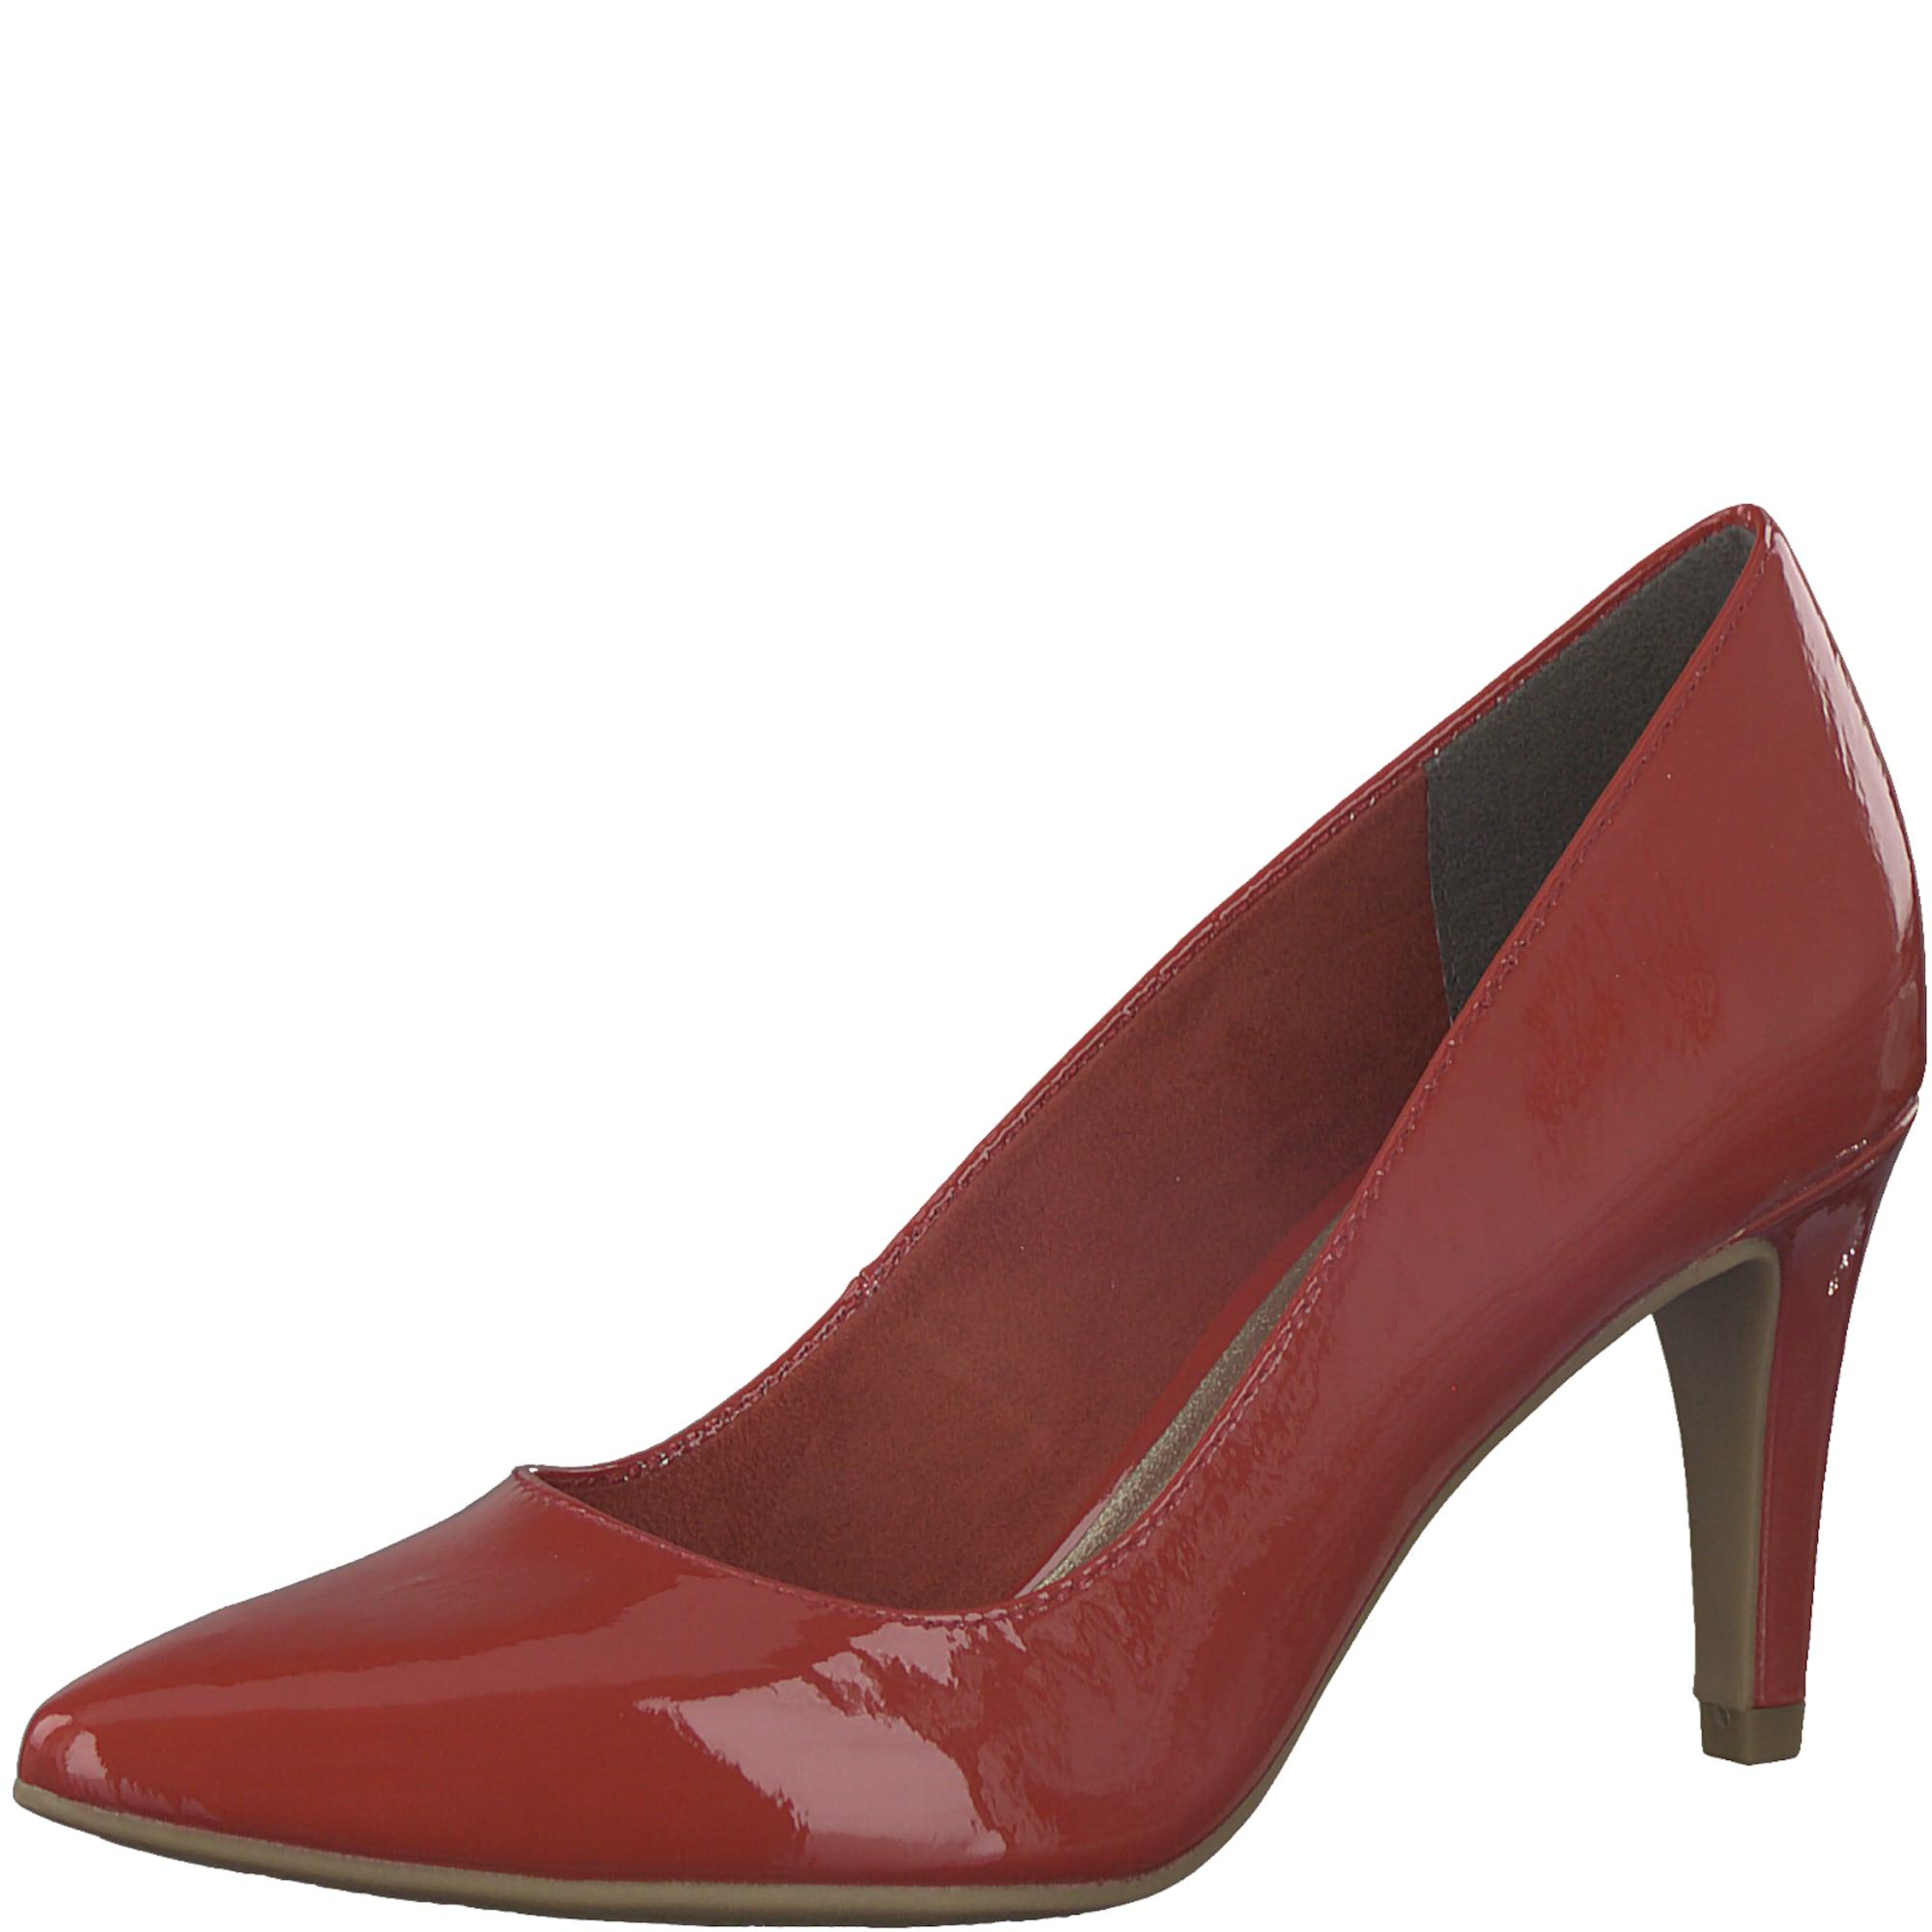 TAMARIS, Dames Pumps, rood